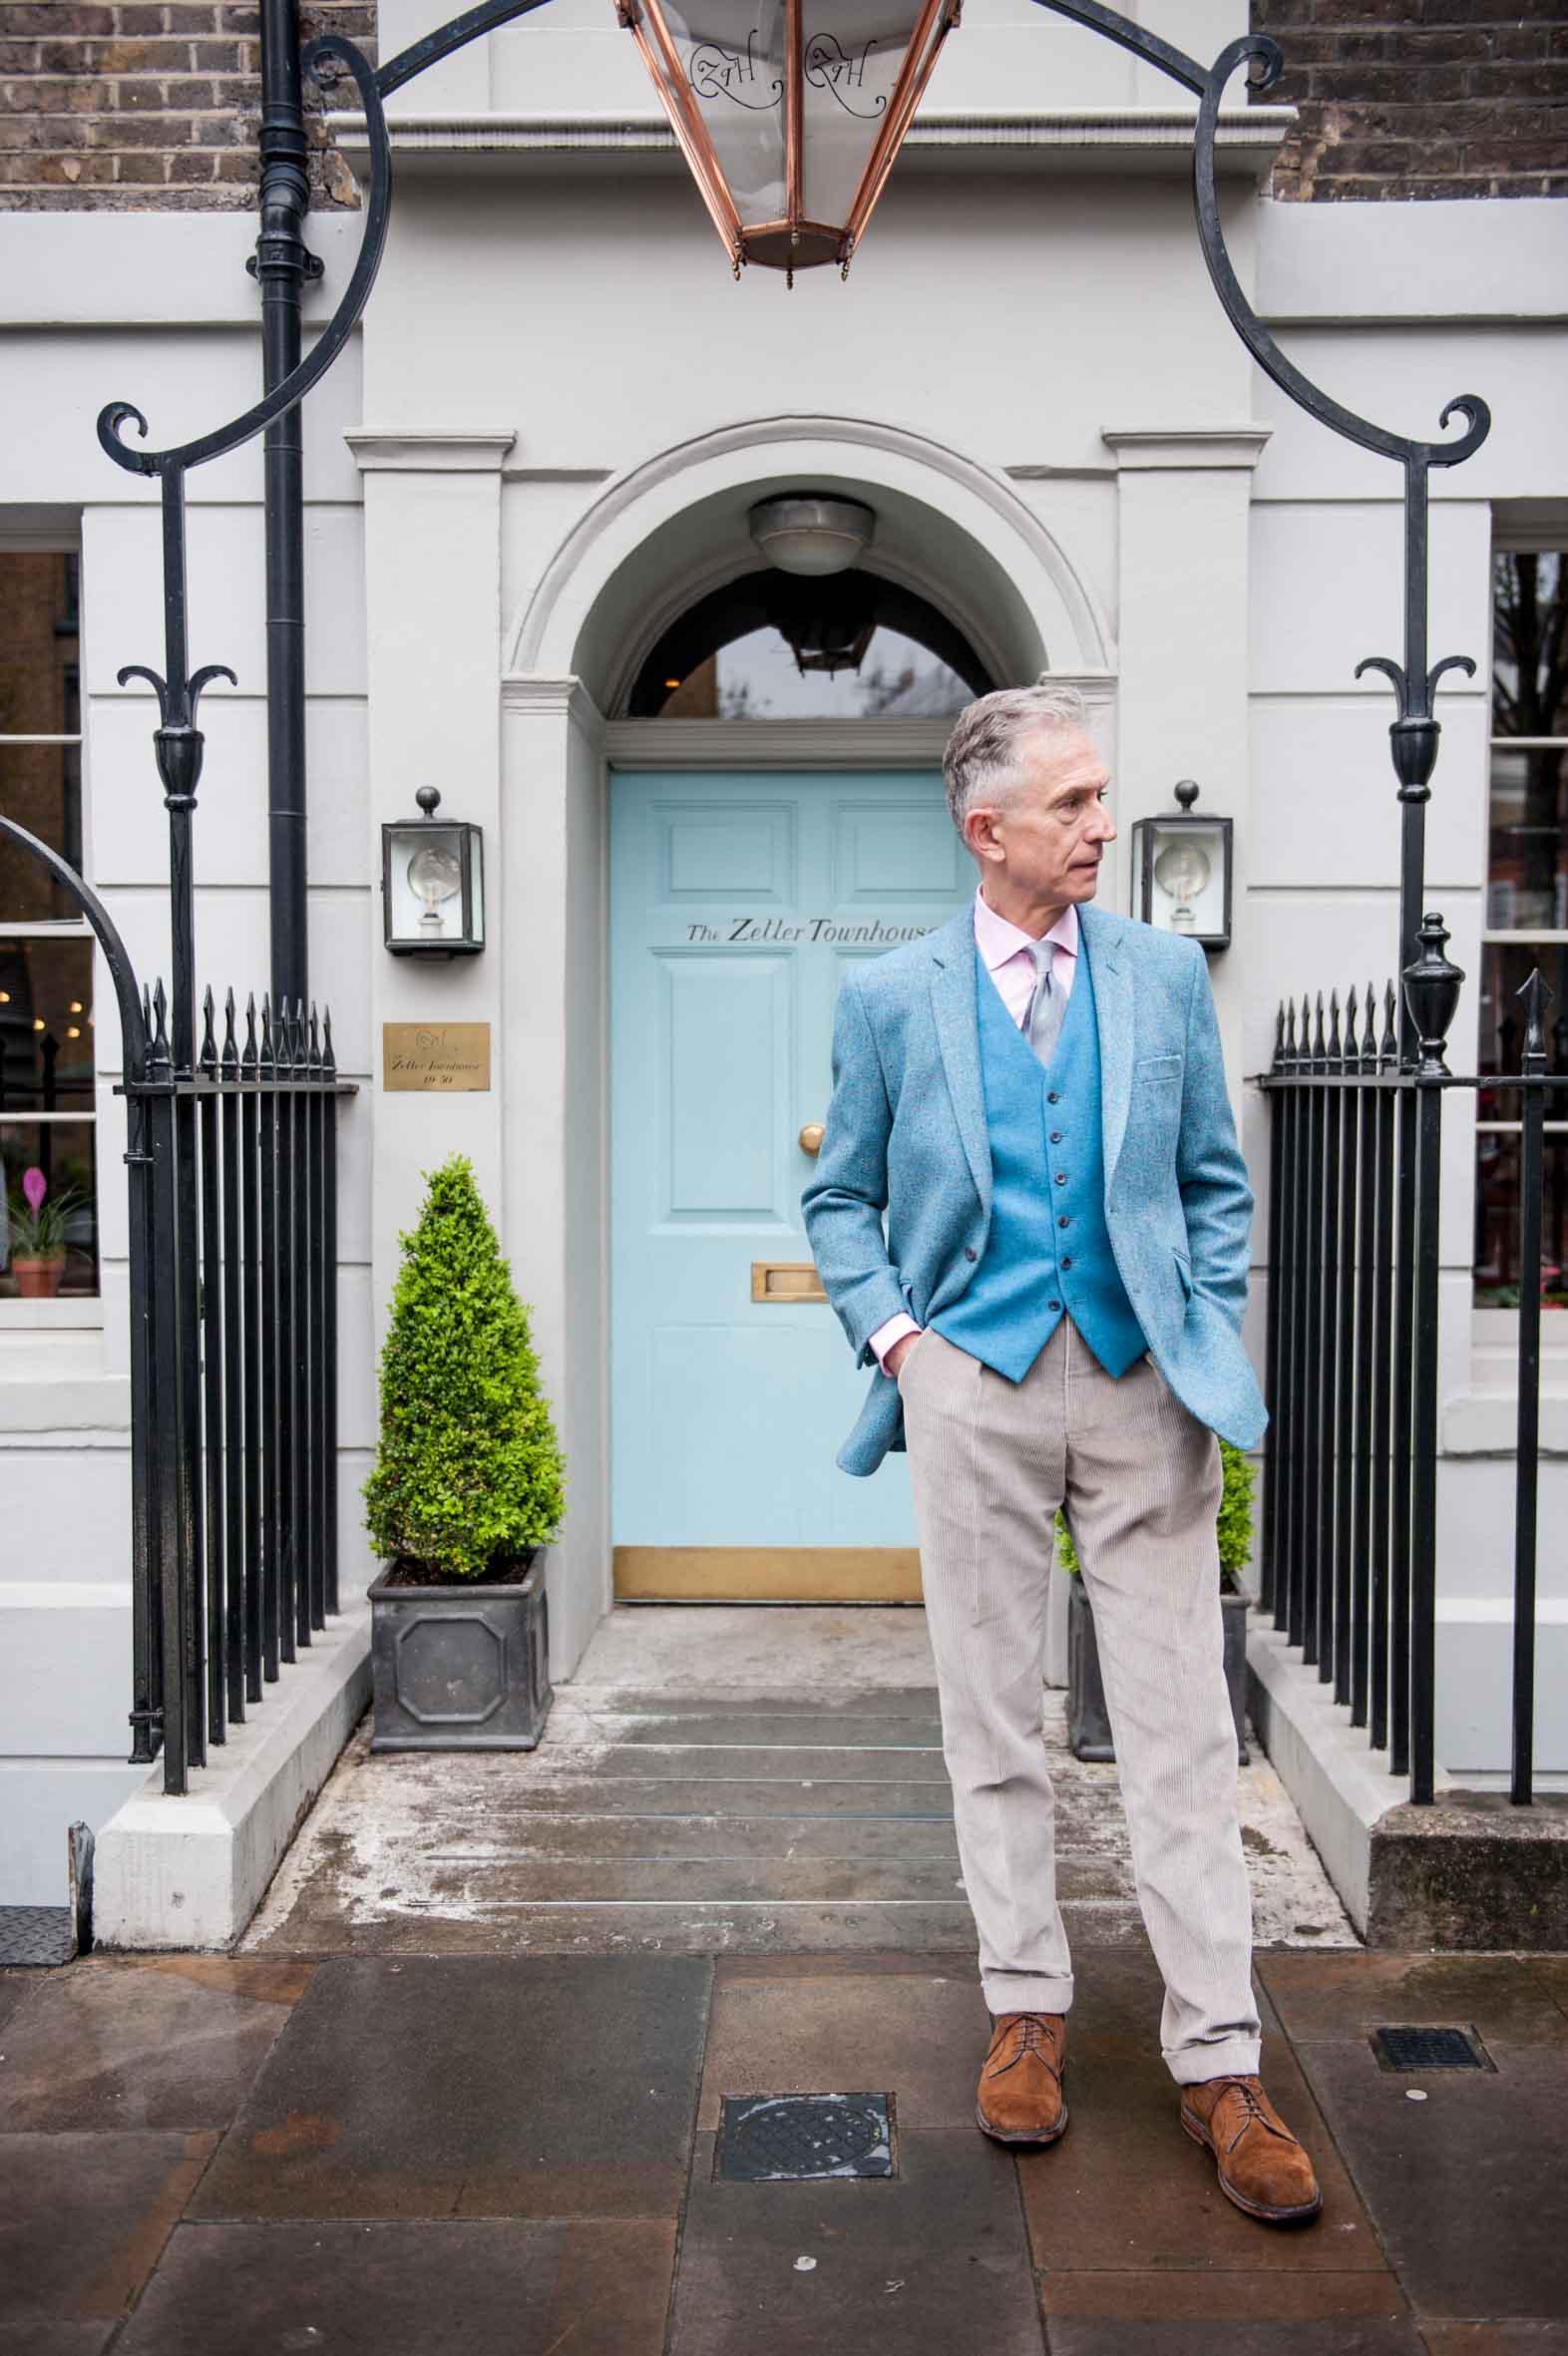 susannah-hall-bespoke-tailor-tweed-jacket-waistcoat-cord-trousers-woven-bone-abraham-moon-porter-harding-grey-fox-blog-made-britain.jpg